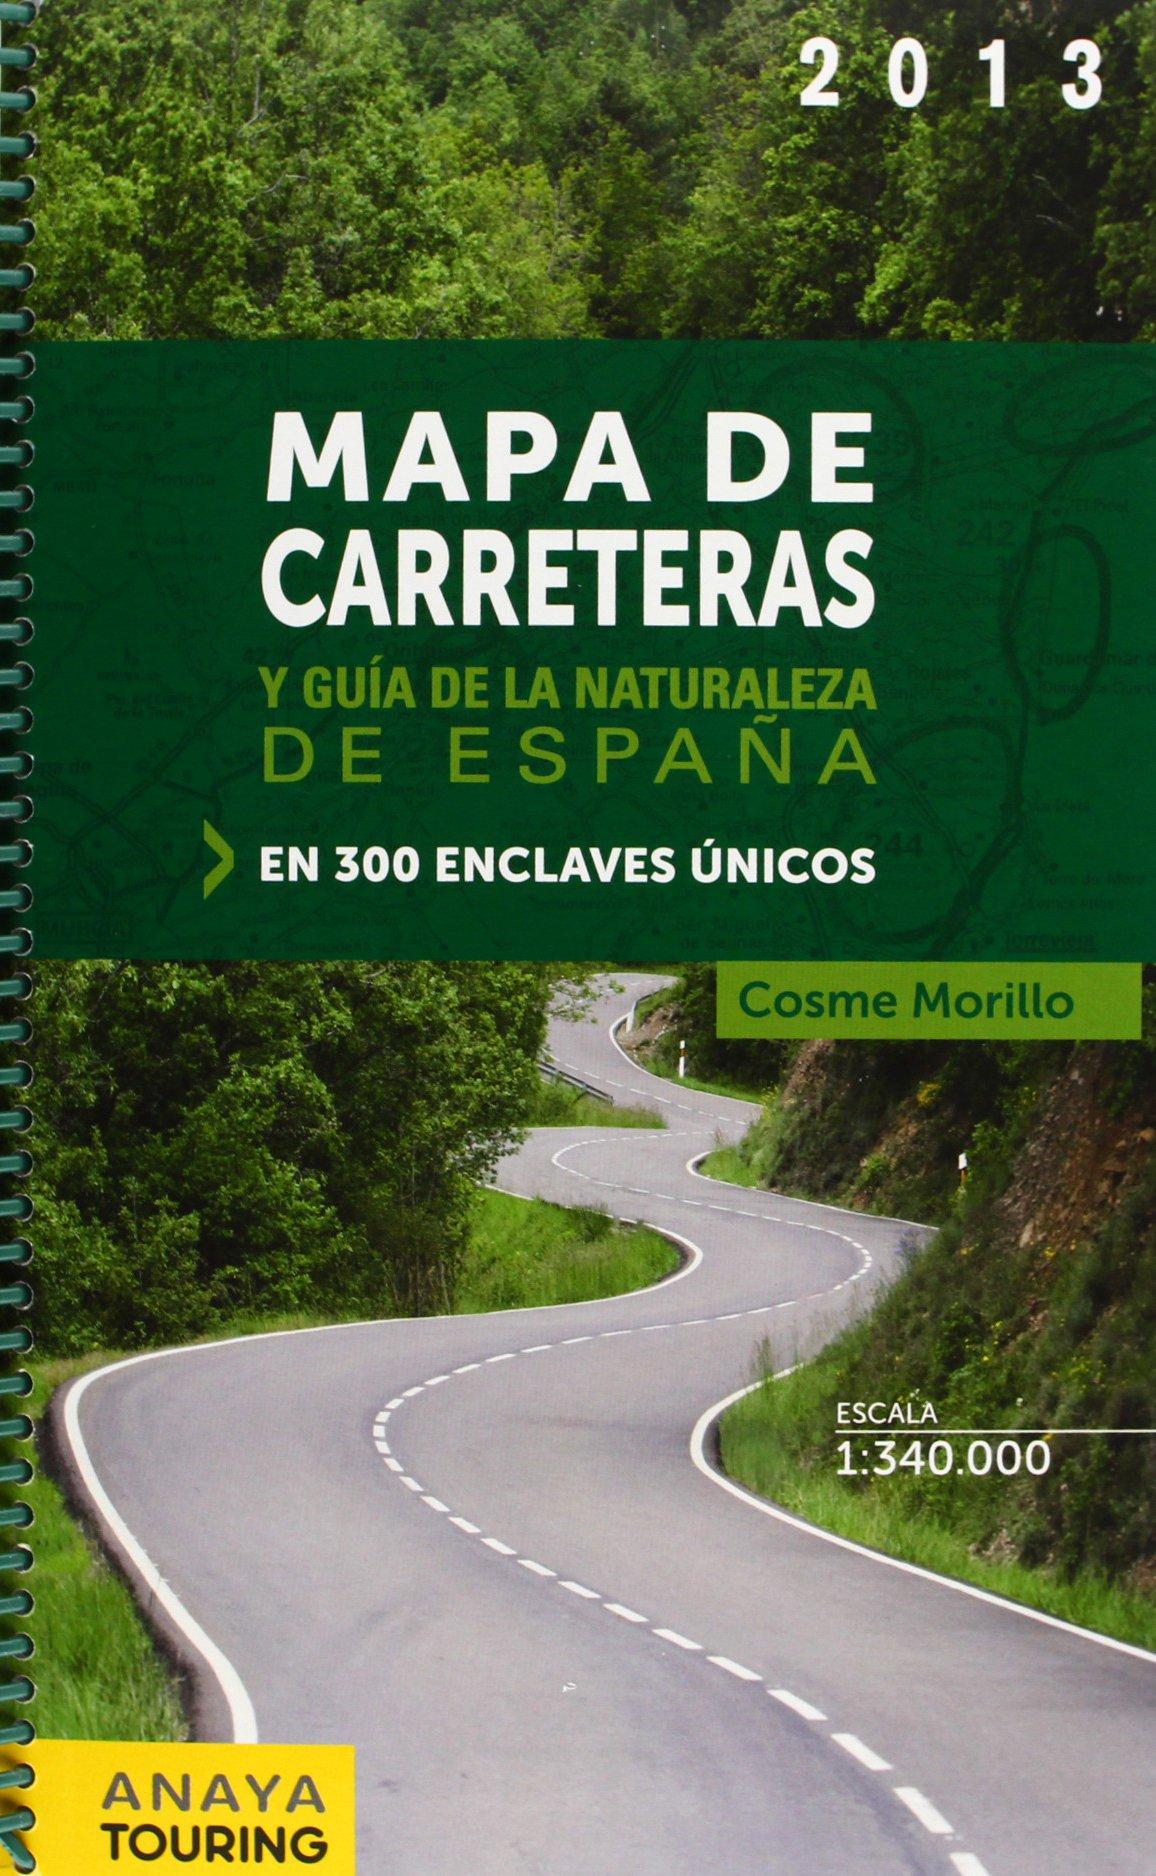 Mapa De Carreteras Y Guía De La Naturaleza De España 2013 Mapa Touring: Amazon.es: Morillo Fernández, Cosme: Libros